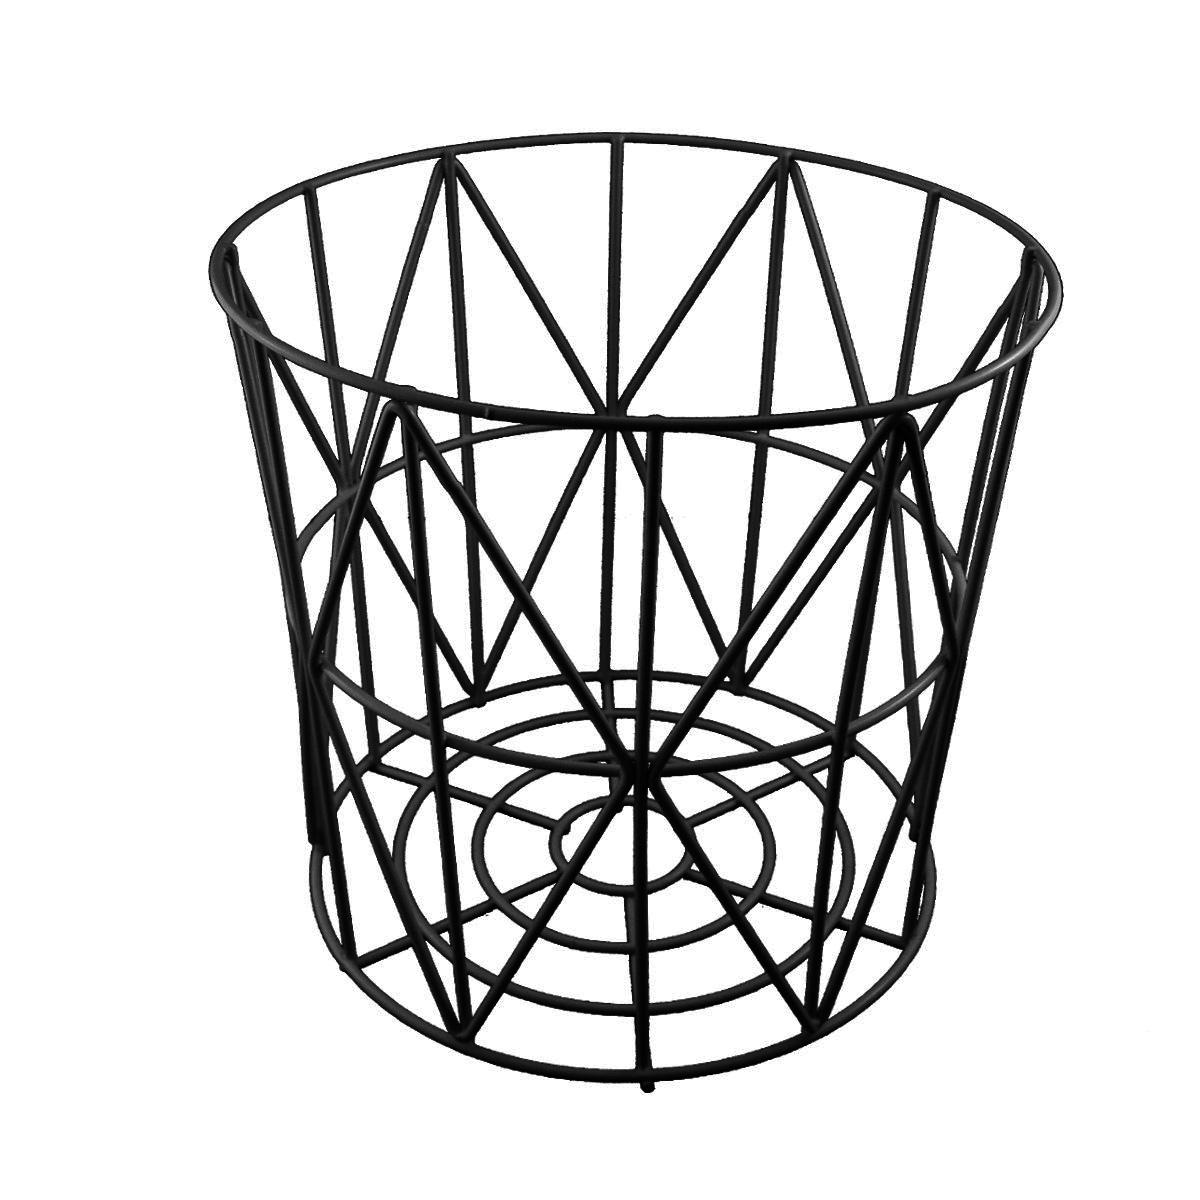 PrimoLiving Design Drahtkoerbe In 4 Groessen Drahtkorb Tisch